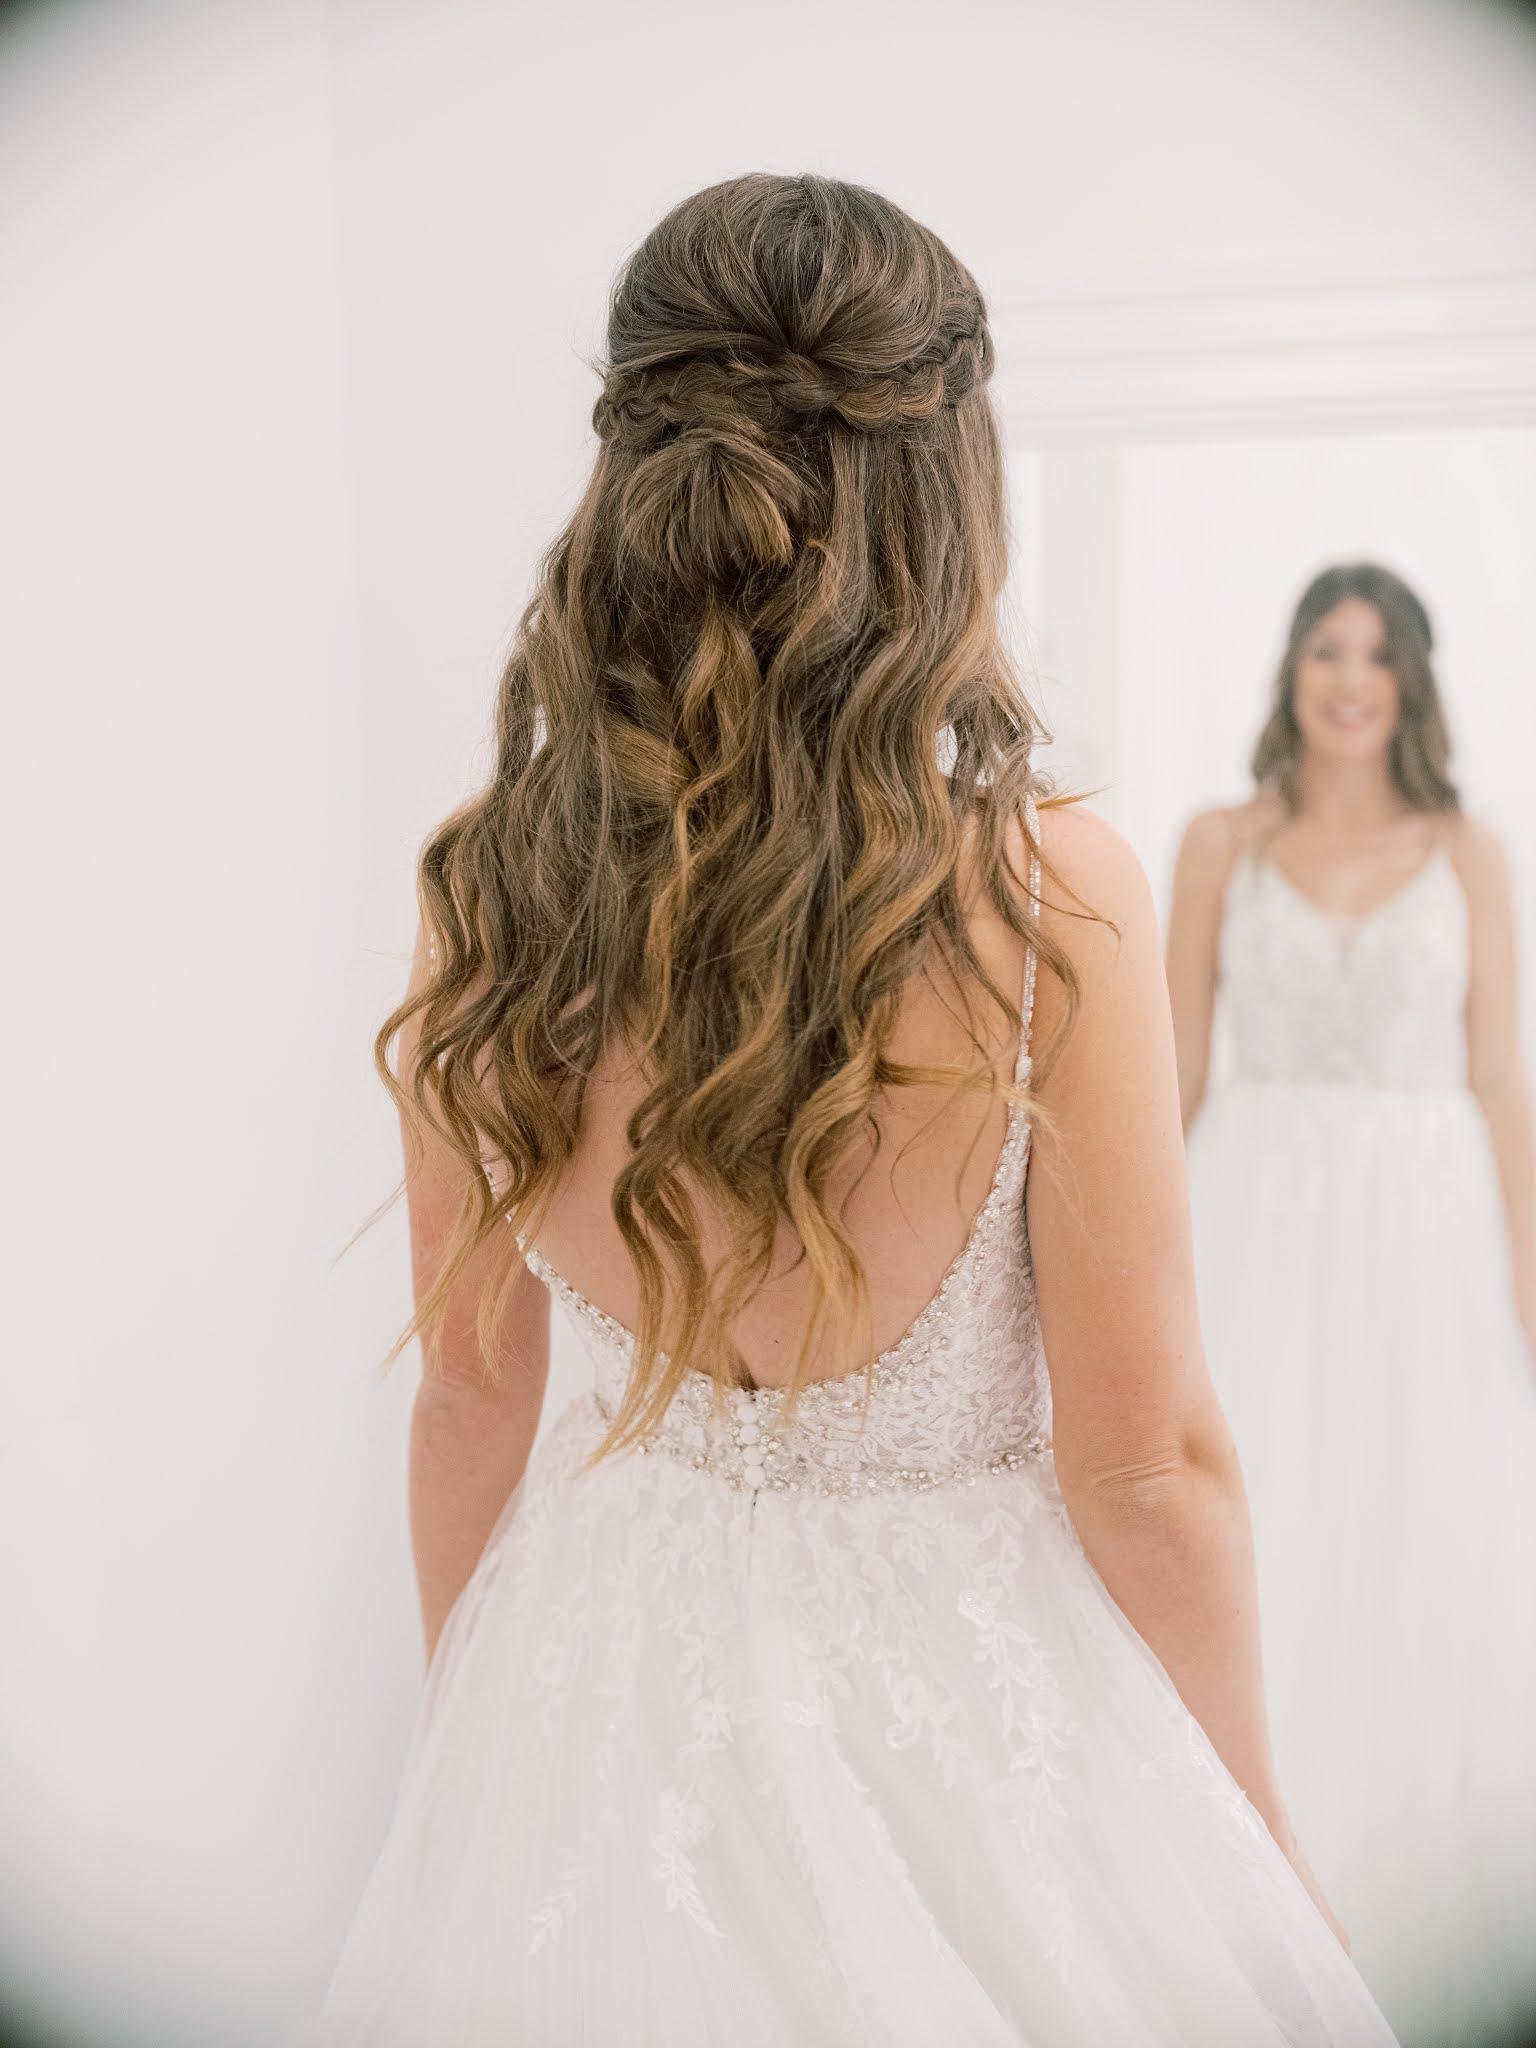 Charleston Wedding Hair Half Up - Chasing Cinderella